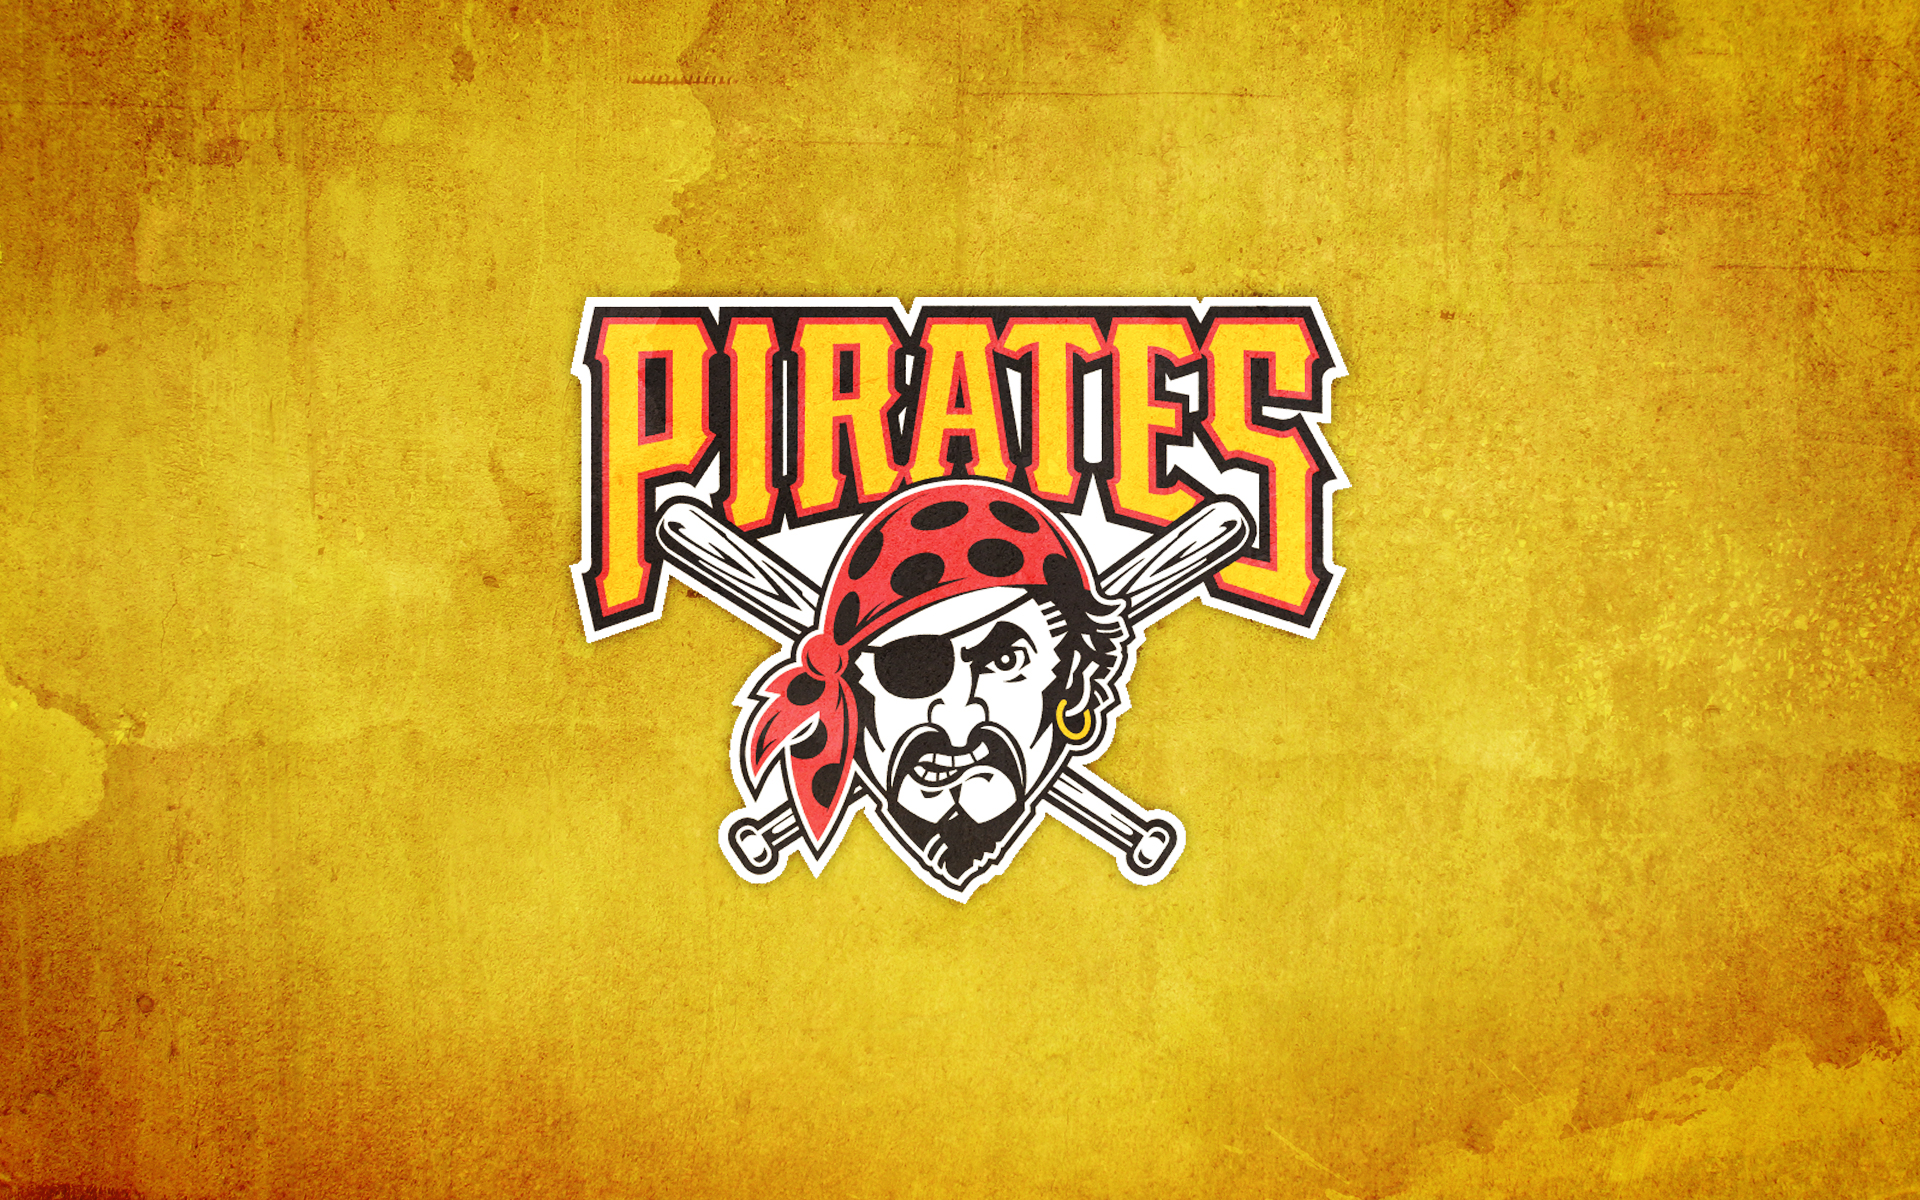 One Piece Wallpaper Iphone Pittsburgh Pirates Logo Wallpapers Hd Pixelstalk Net